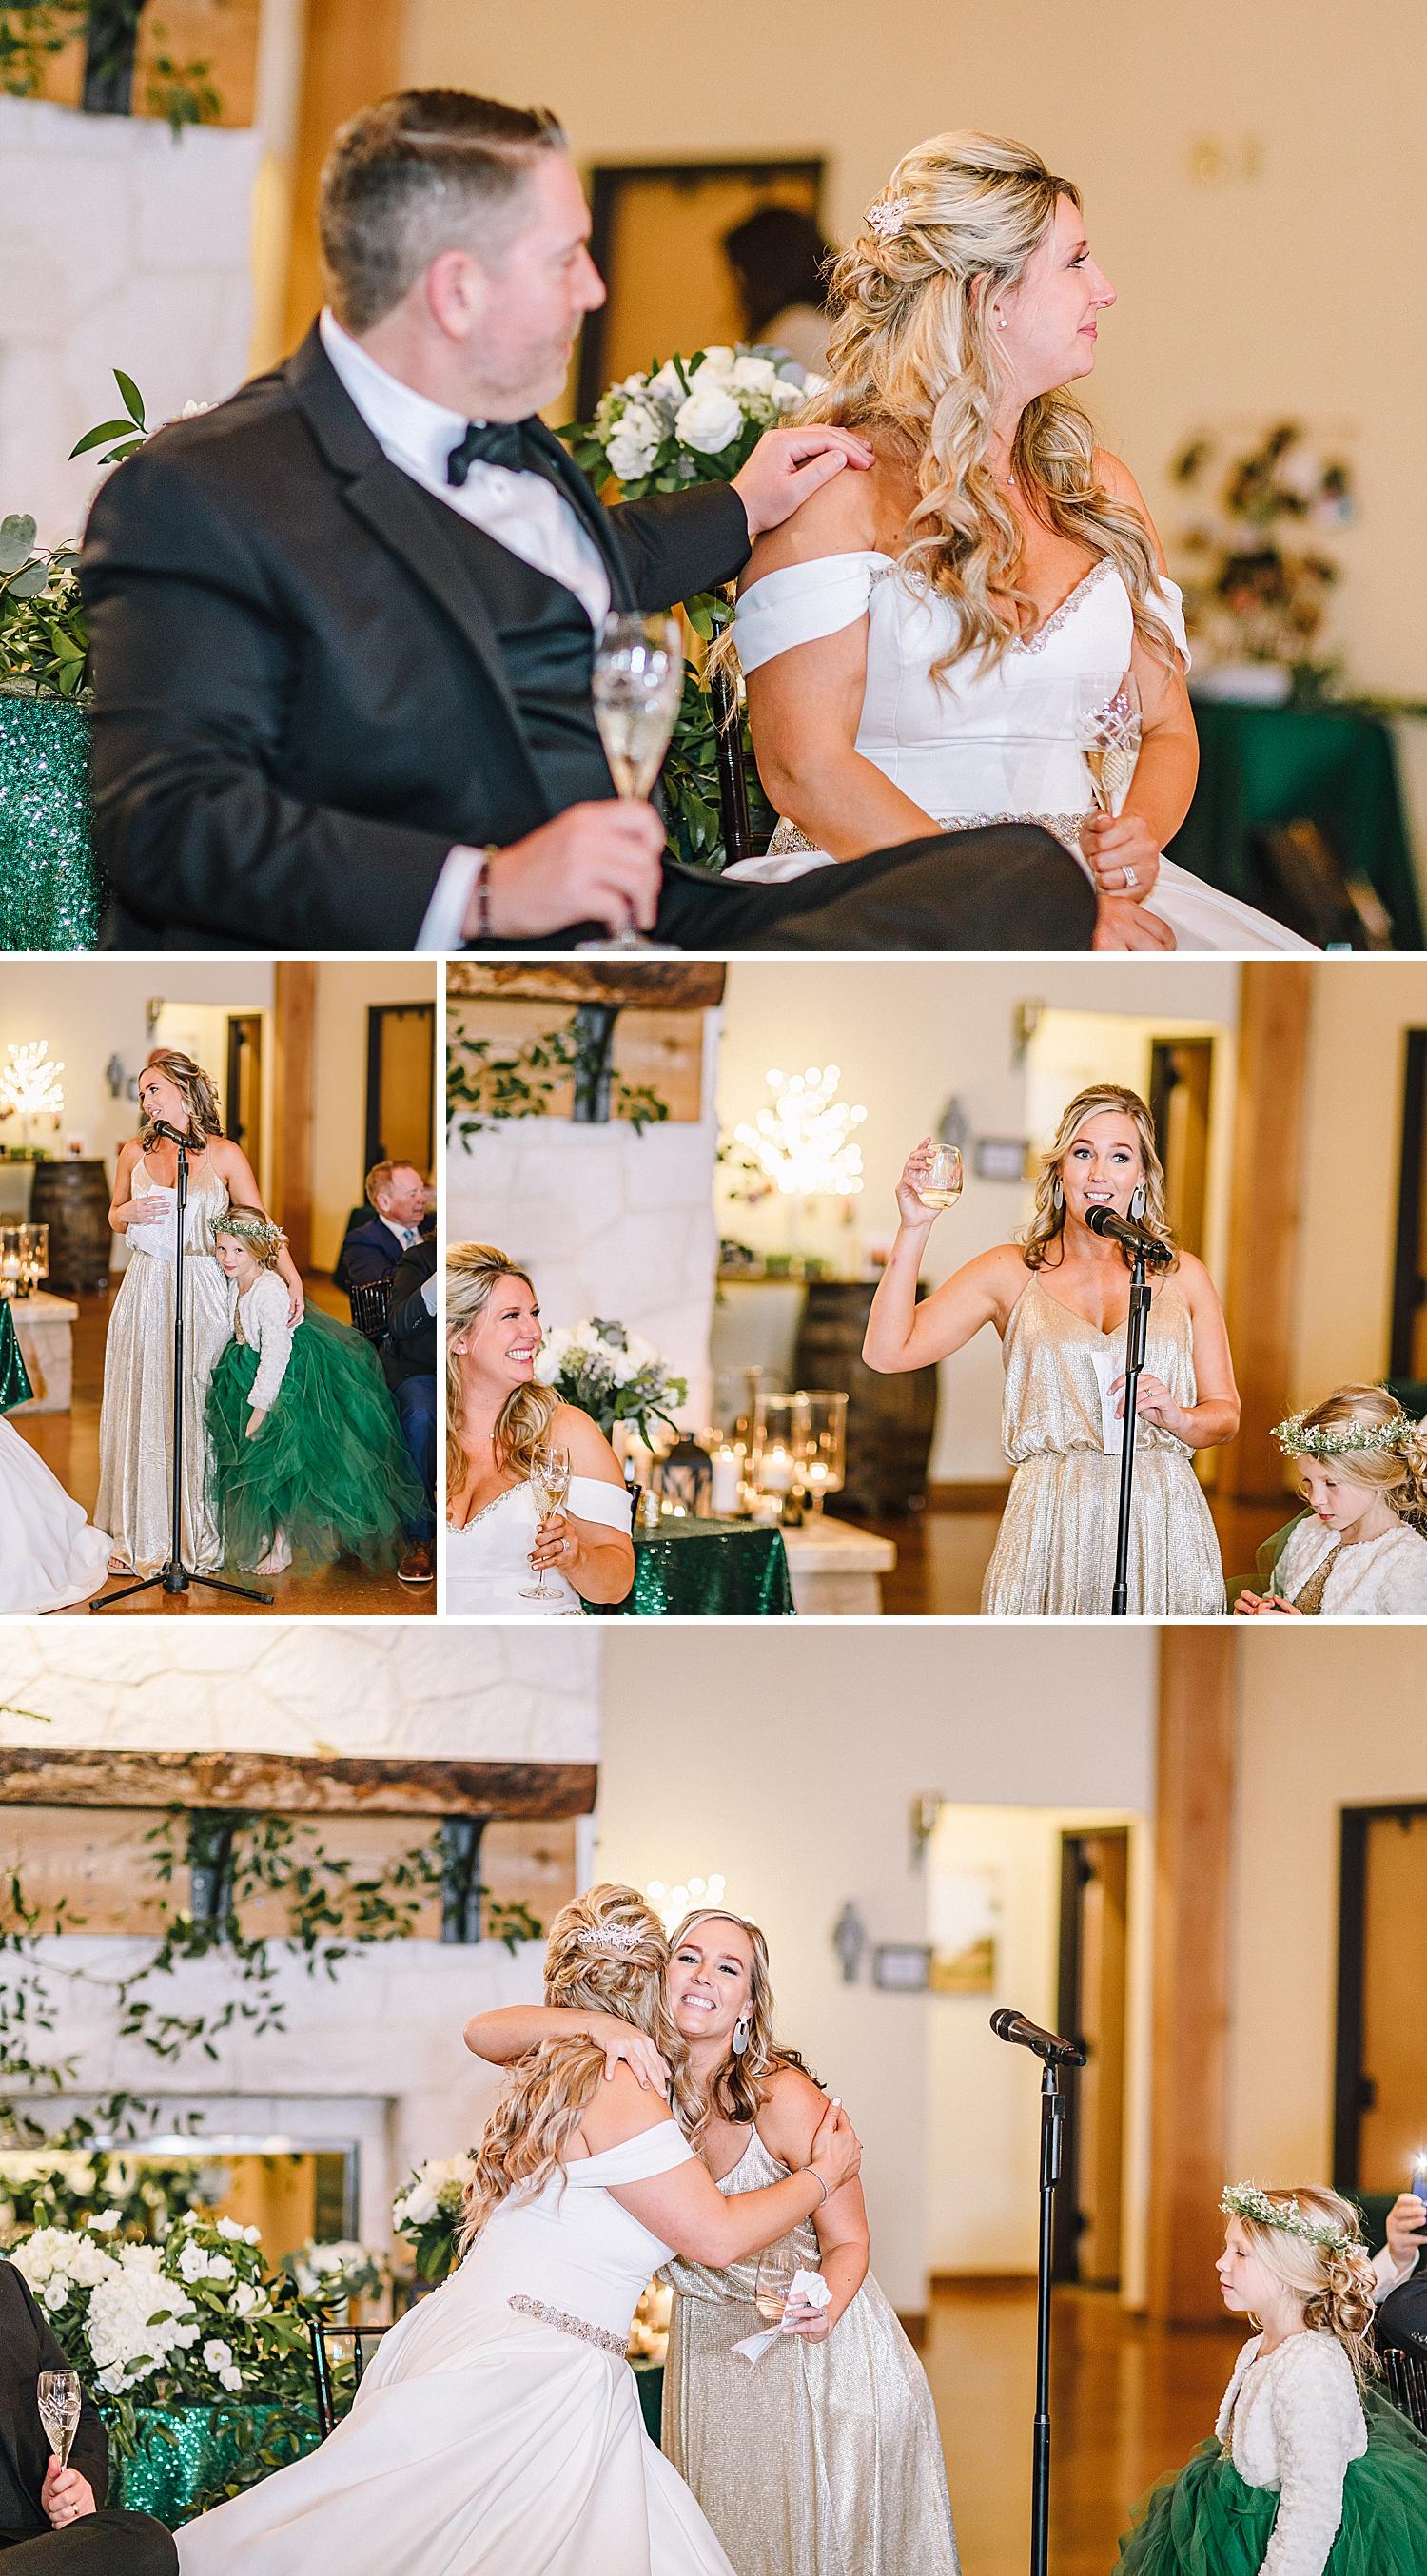 Magnolia-Halle-Wedding-San-Antonio-Texas-Bride-Grom_0098.jpg